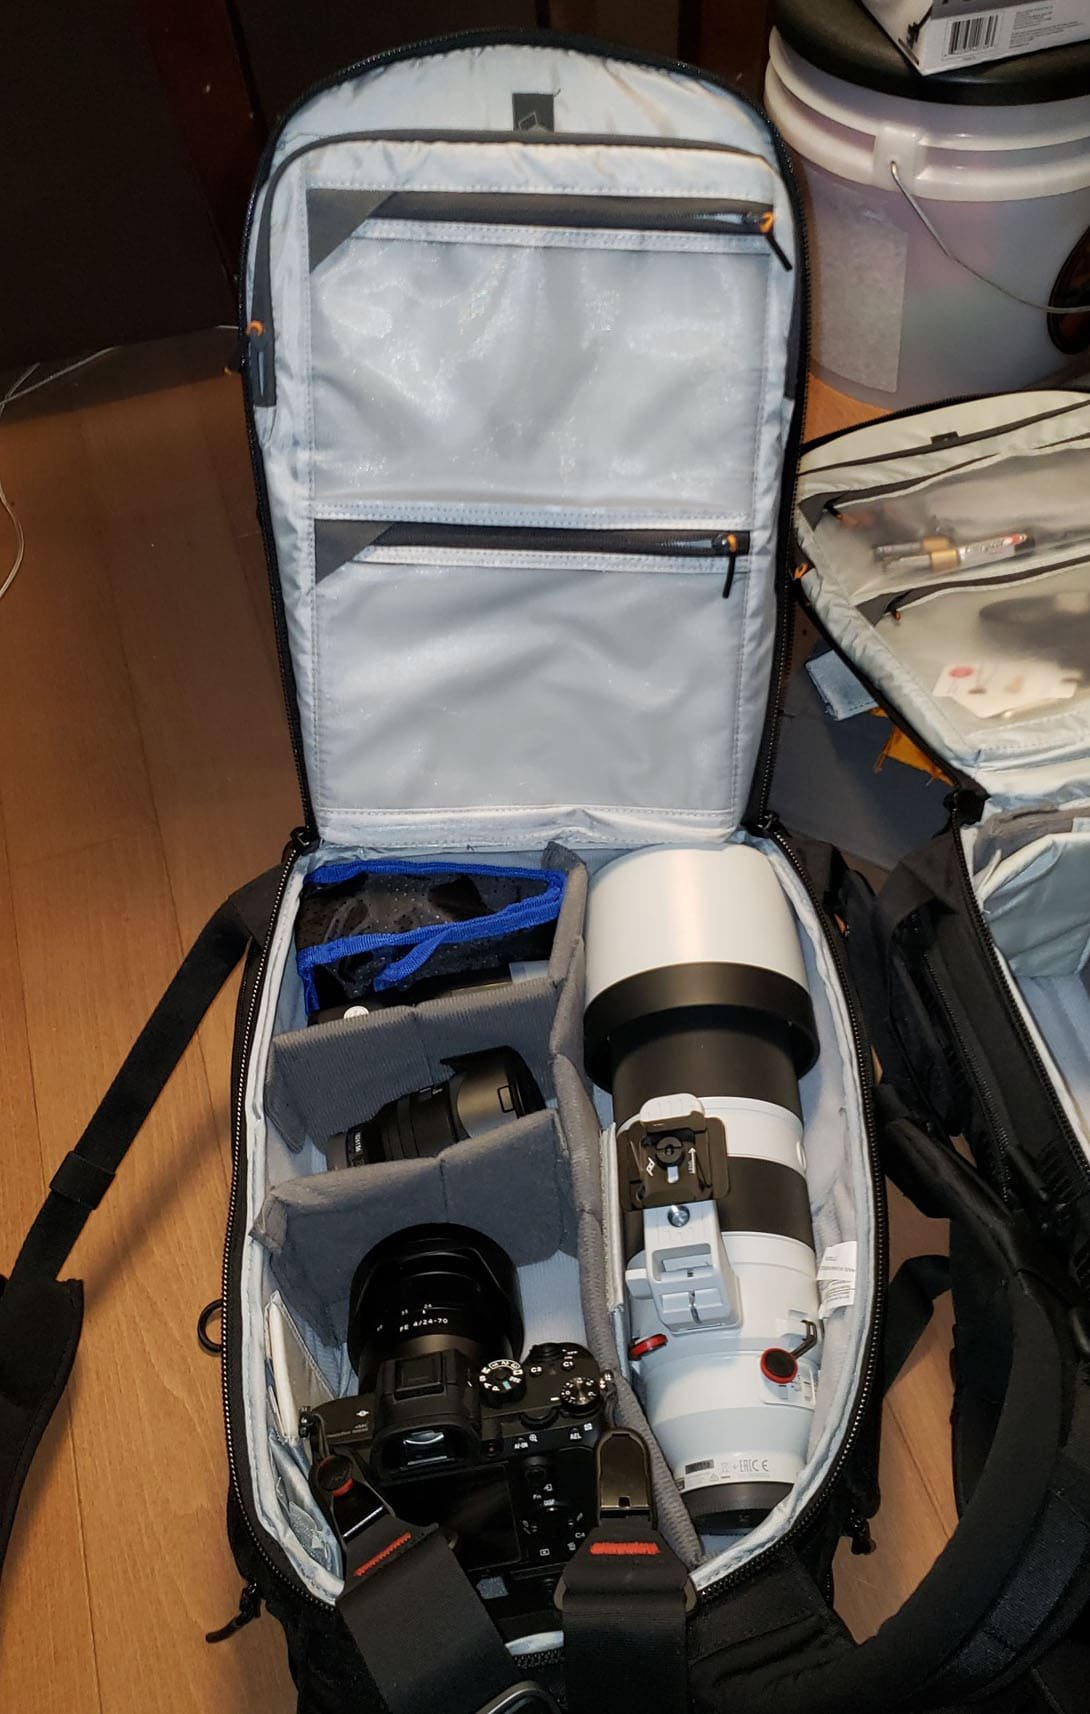 LowePro ProTactic BP 350 AW II with Sony FE 200-600 Inside